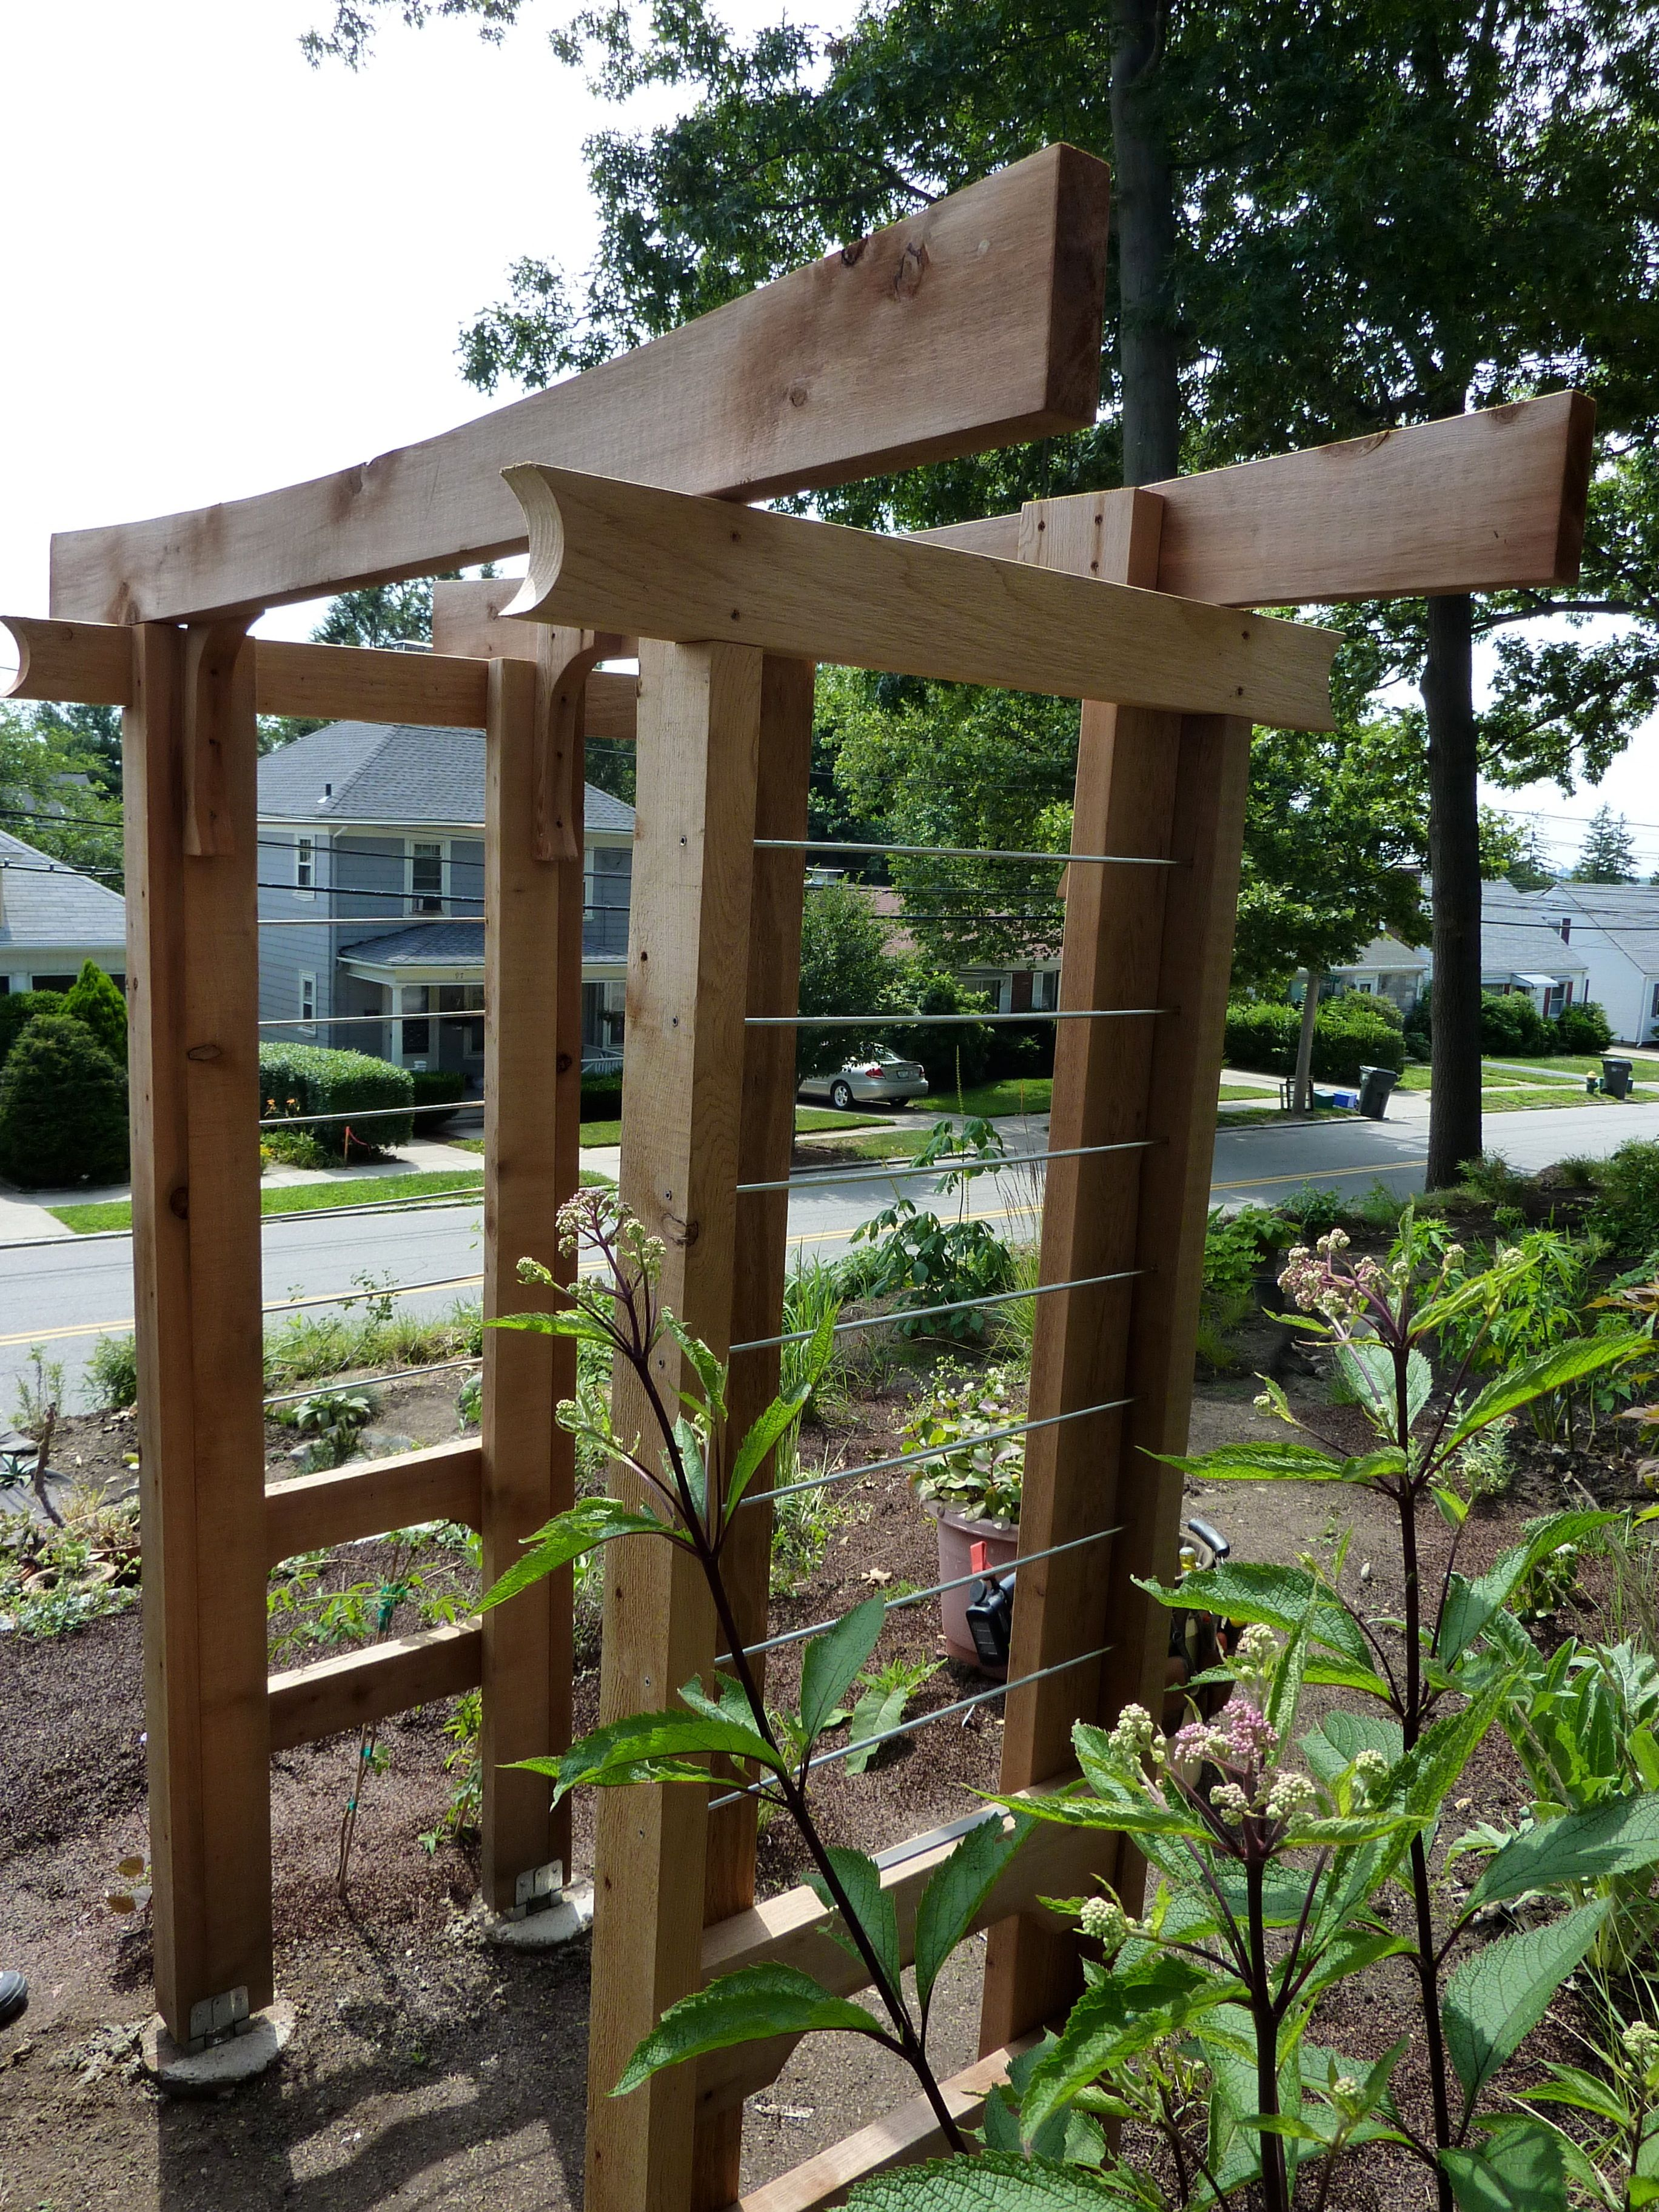 DIY Arbor Trellis | Pinterest | Metal trellis, Arbors and Wood trellis